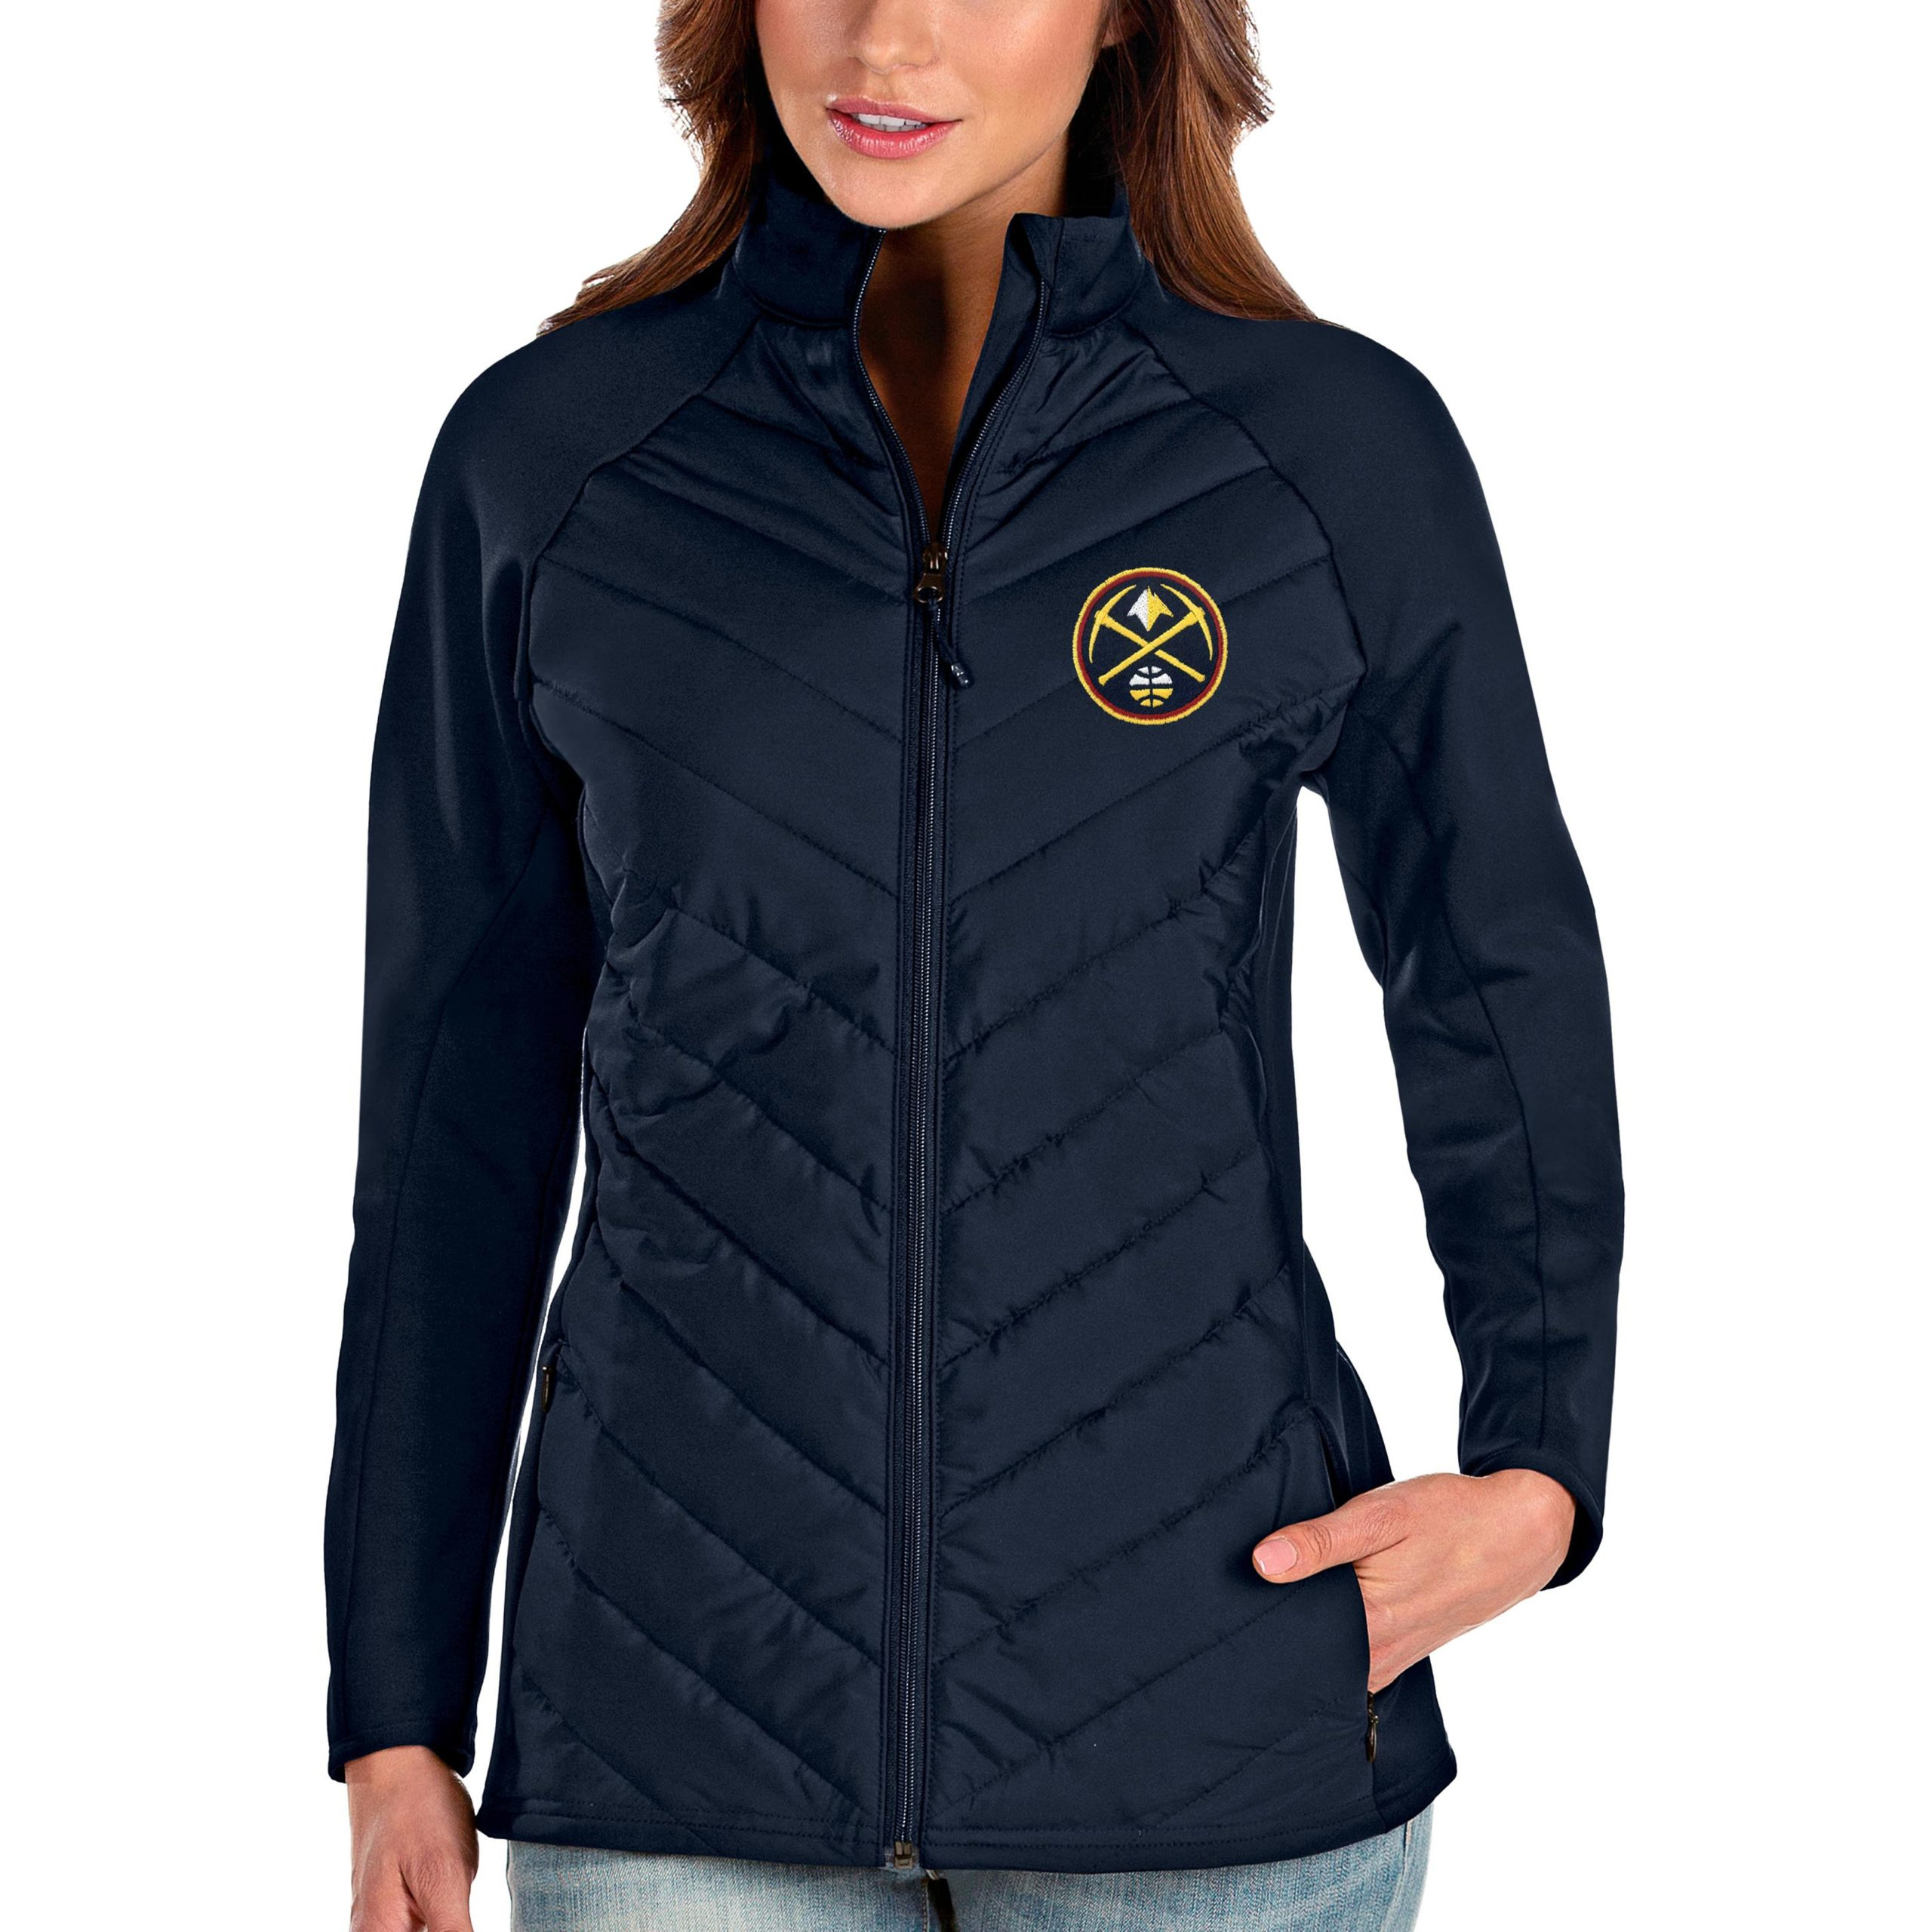 Denver Nuggets Antigua Women's Altitude Full-Zip Jacket - Navy